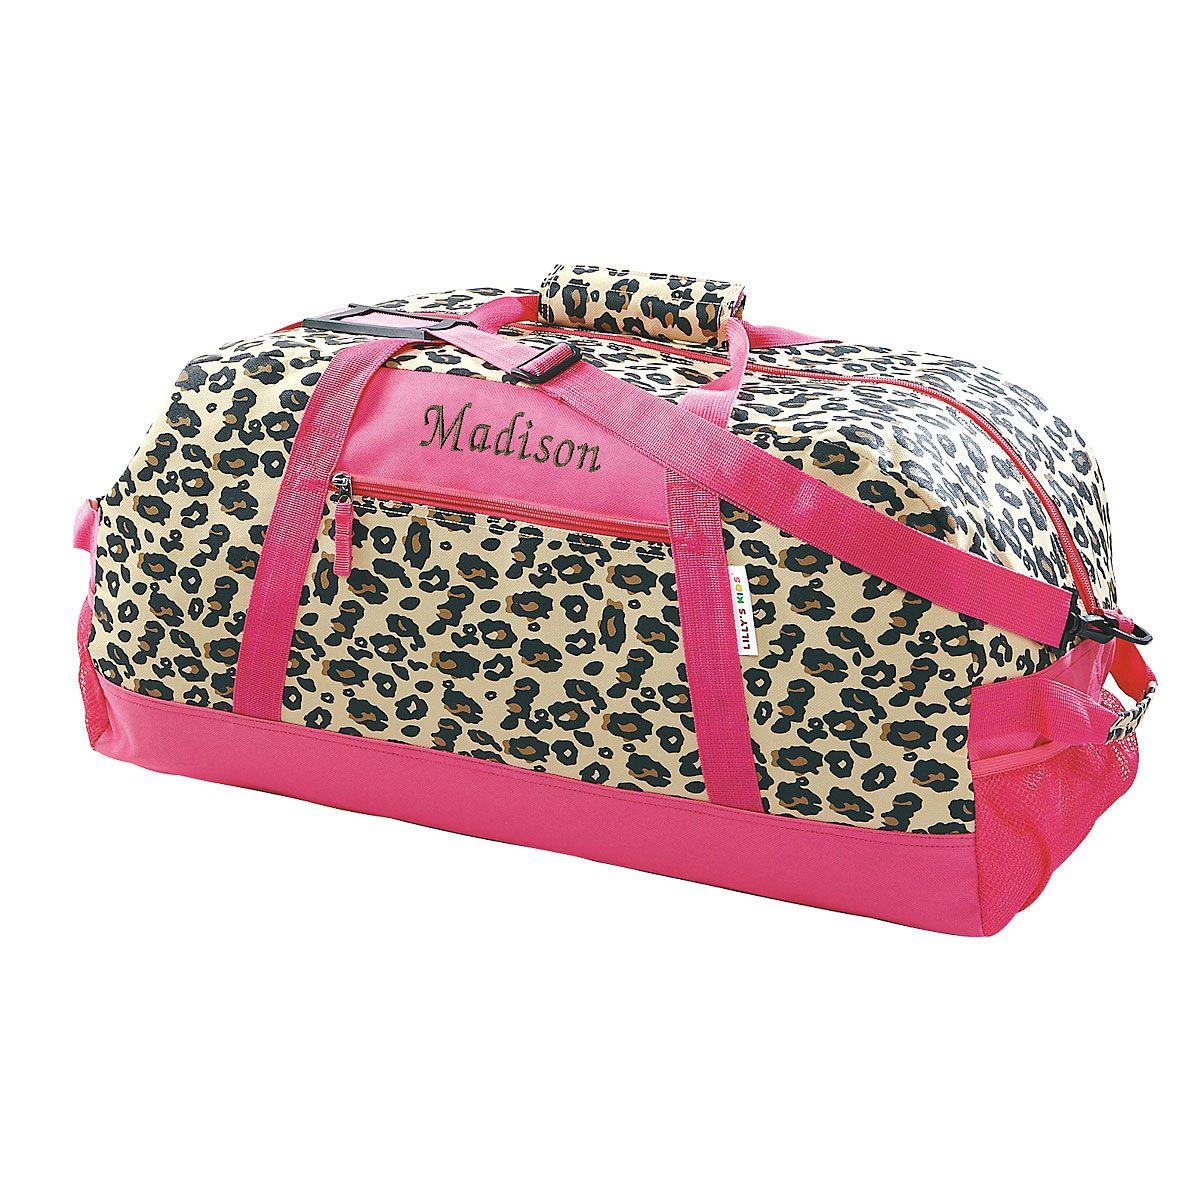 "Leopard Print Personalized 30"" Spots Duffel Bag"